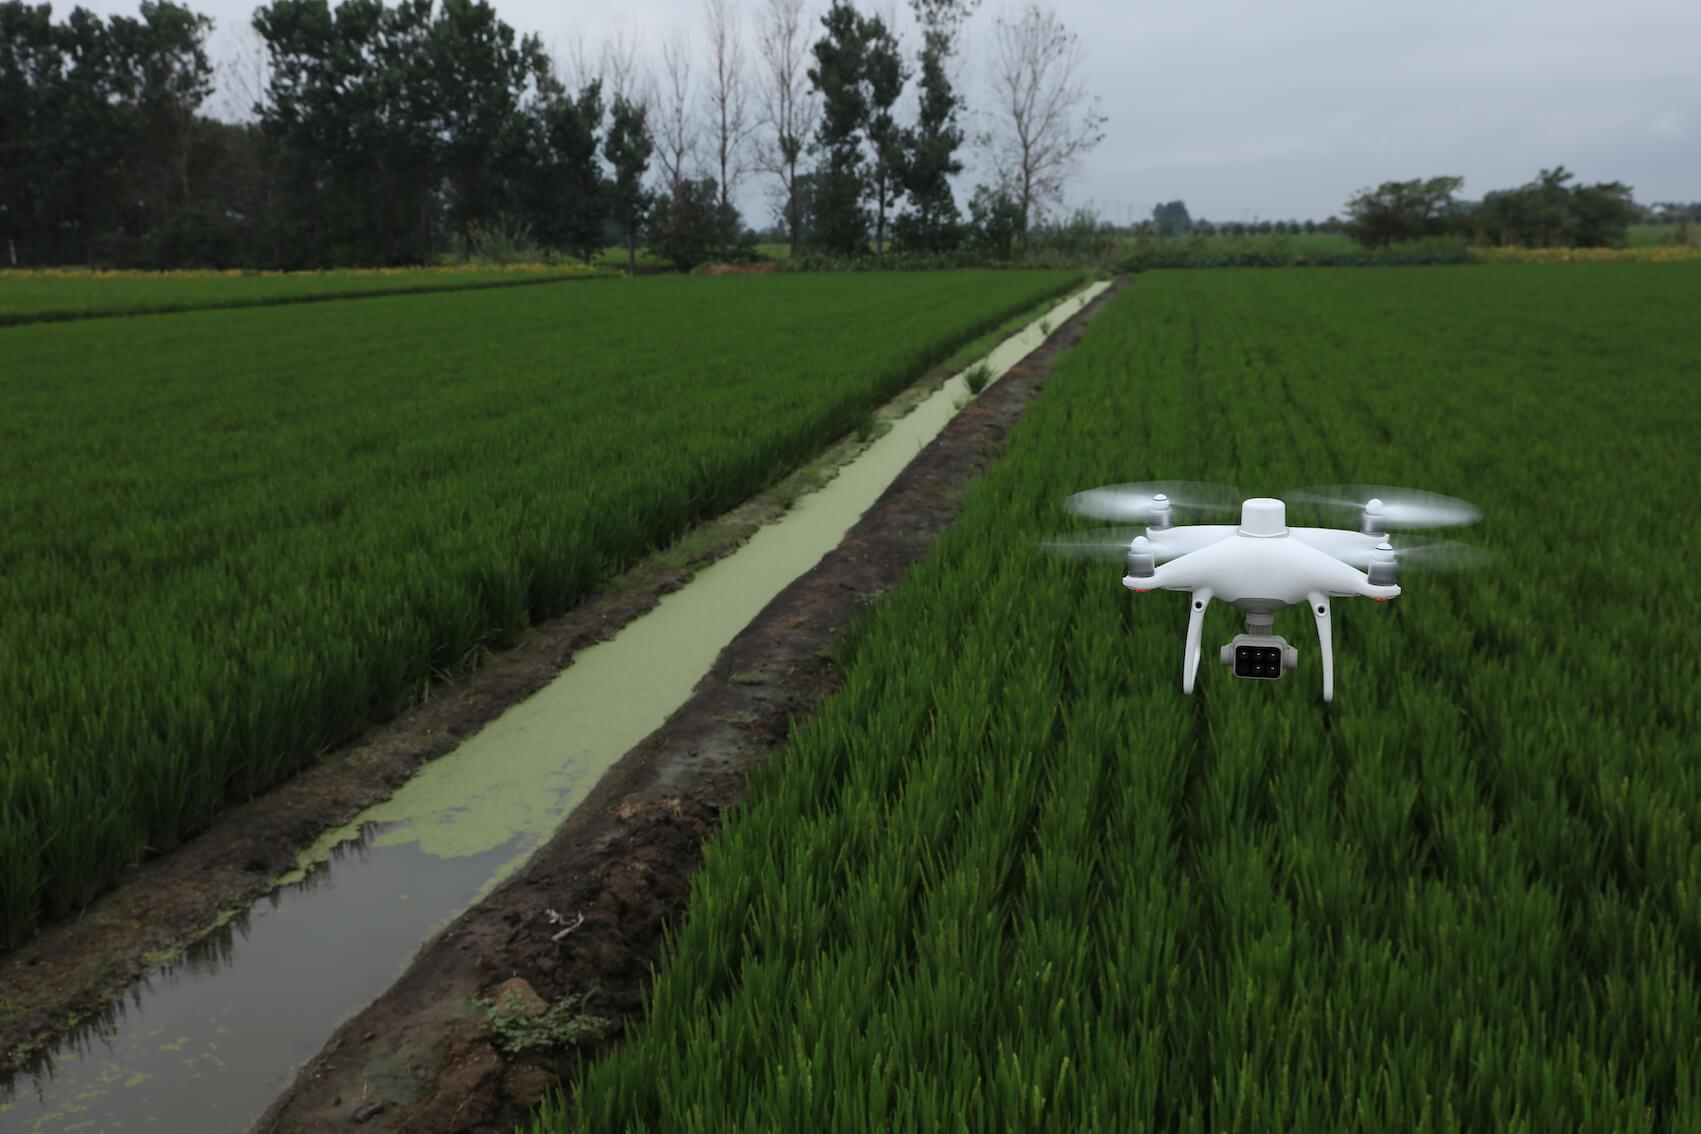 P4 Multispectral precision agriculture